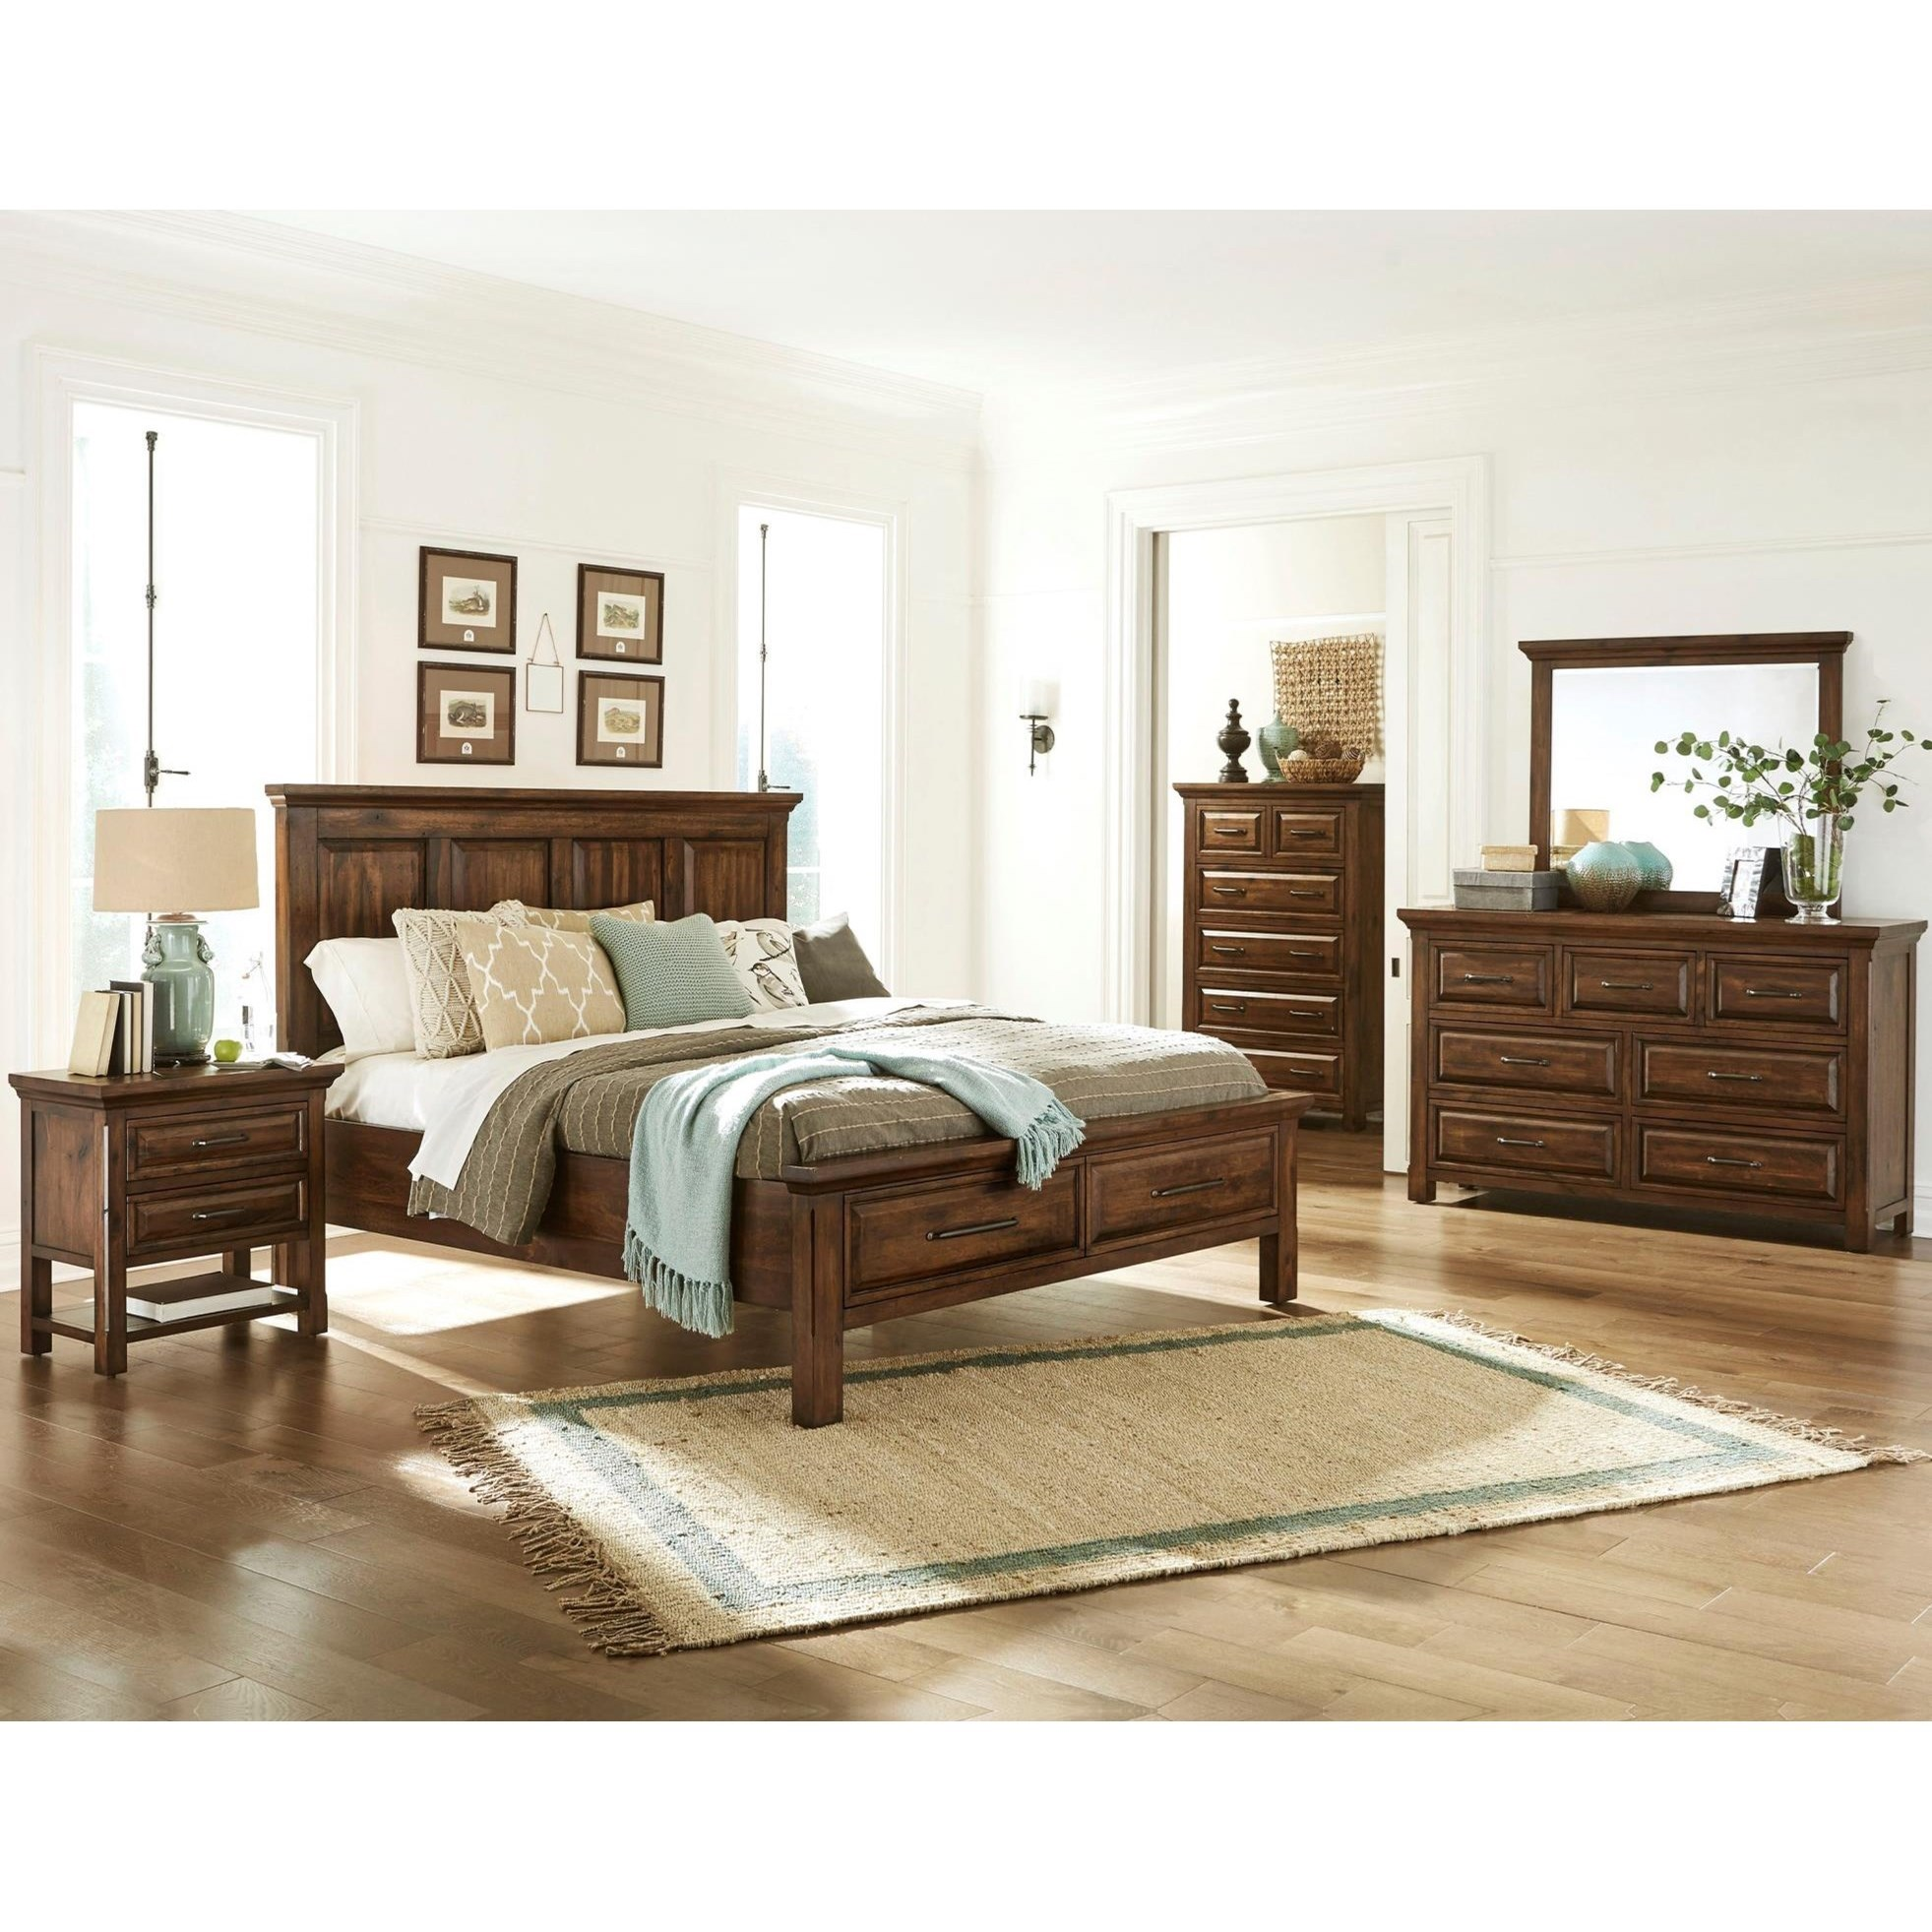 Durham California King Bedroom Group by Virginia Furniture Market Solid Wood at Virginia Furniture Market